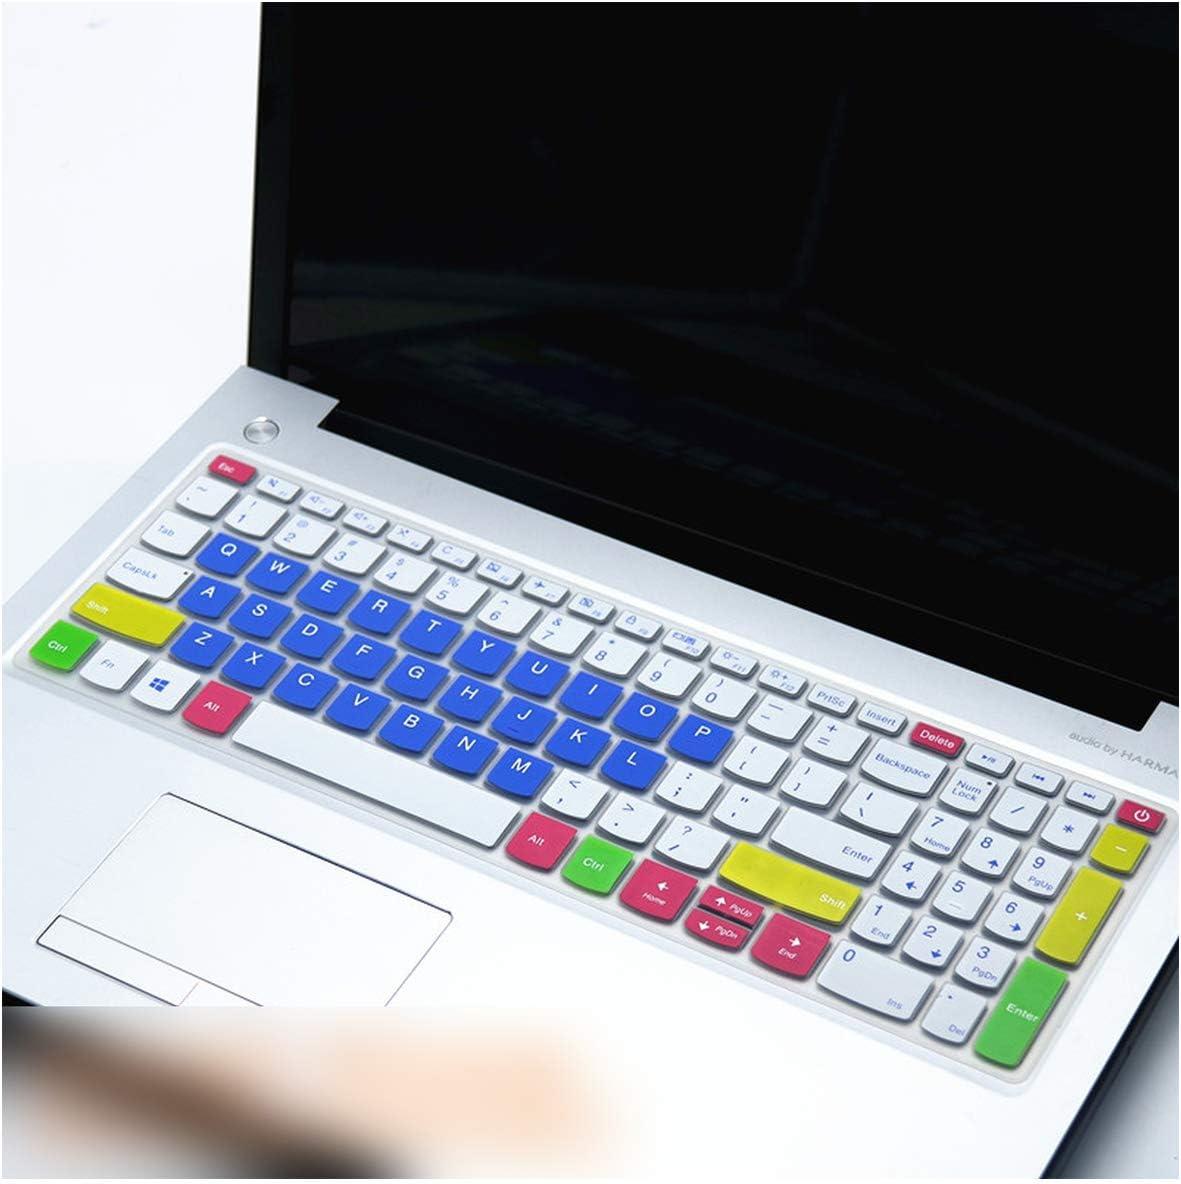 15 Zoll 38,1 cm Laptop Tastatur Abdeckung f/ür Lenovo Ideapad 330s 330S 15IKB 15IKB 320C 330C V330 15IKB V130 V730 V730 15 Flex5 15 one Size Wei/ß//Blau